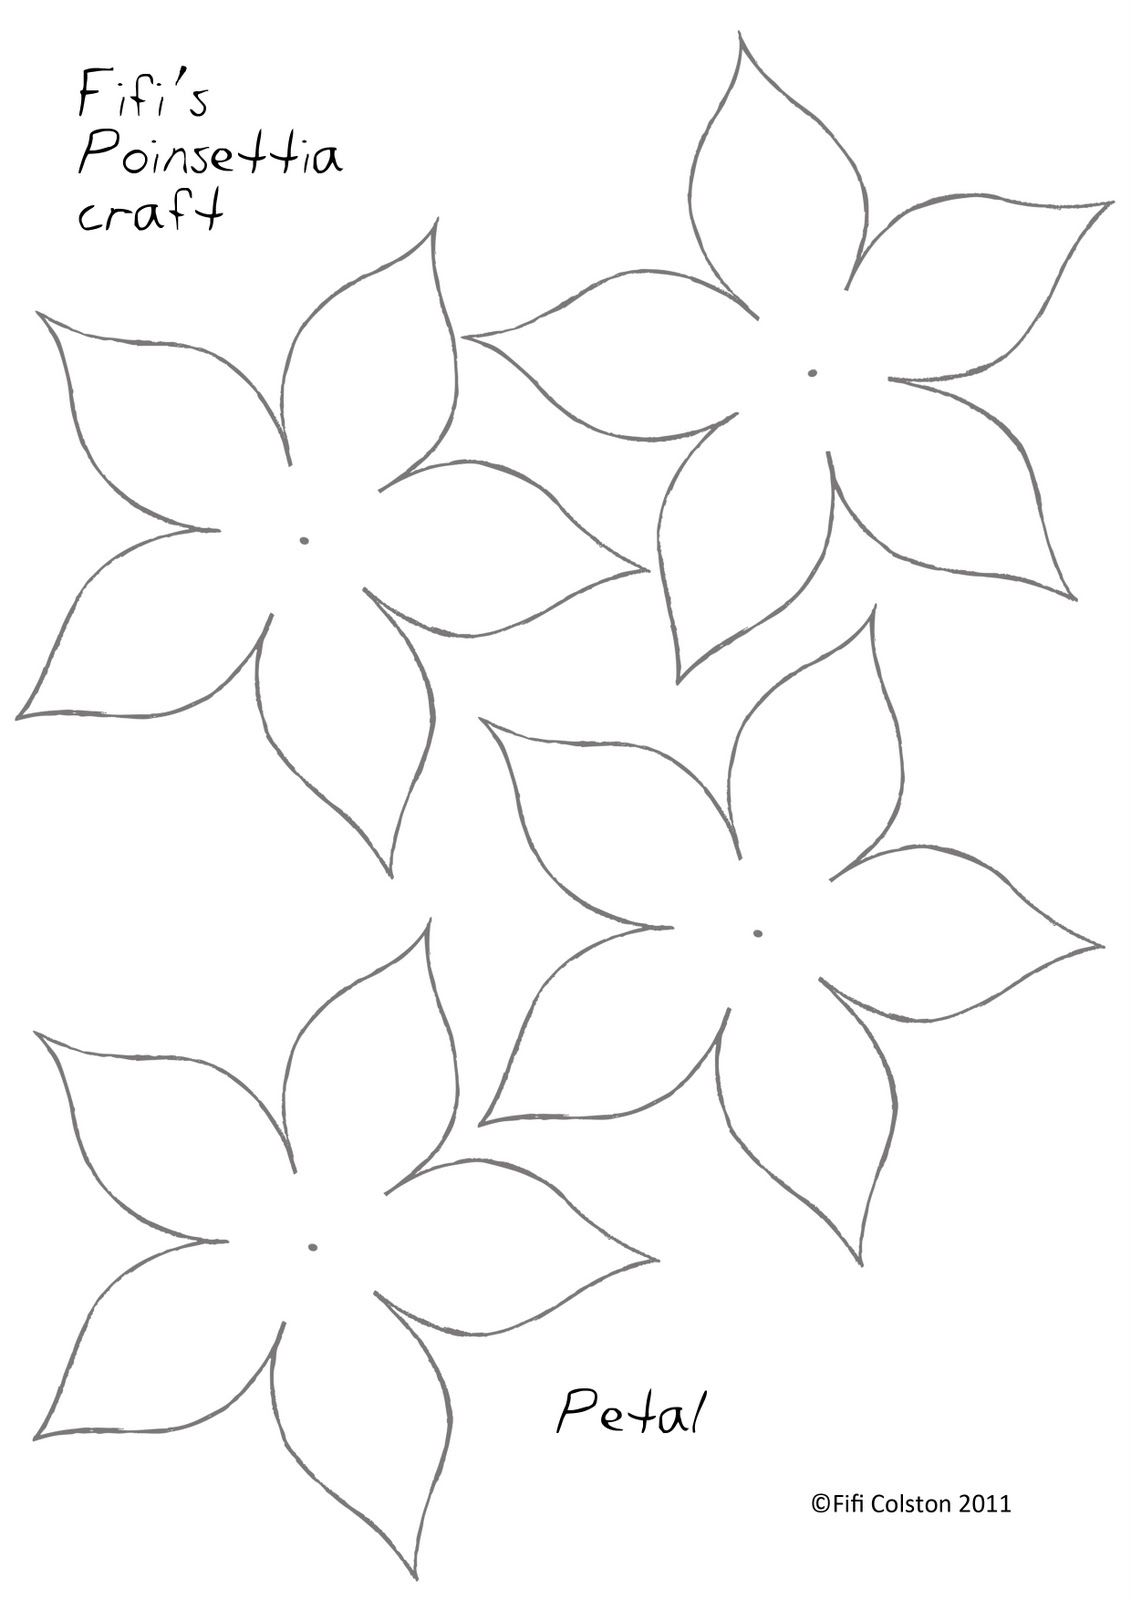 Poinsettia paper flower template pinteres for Paper flower templates martha stewart